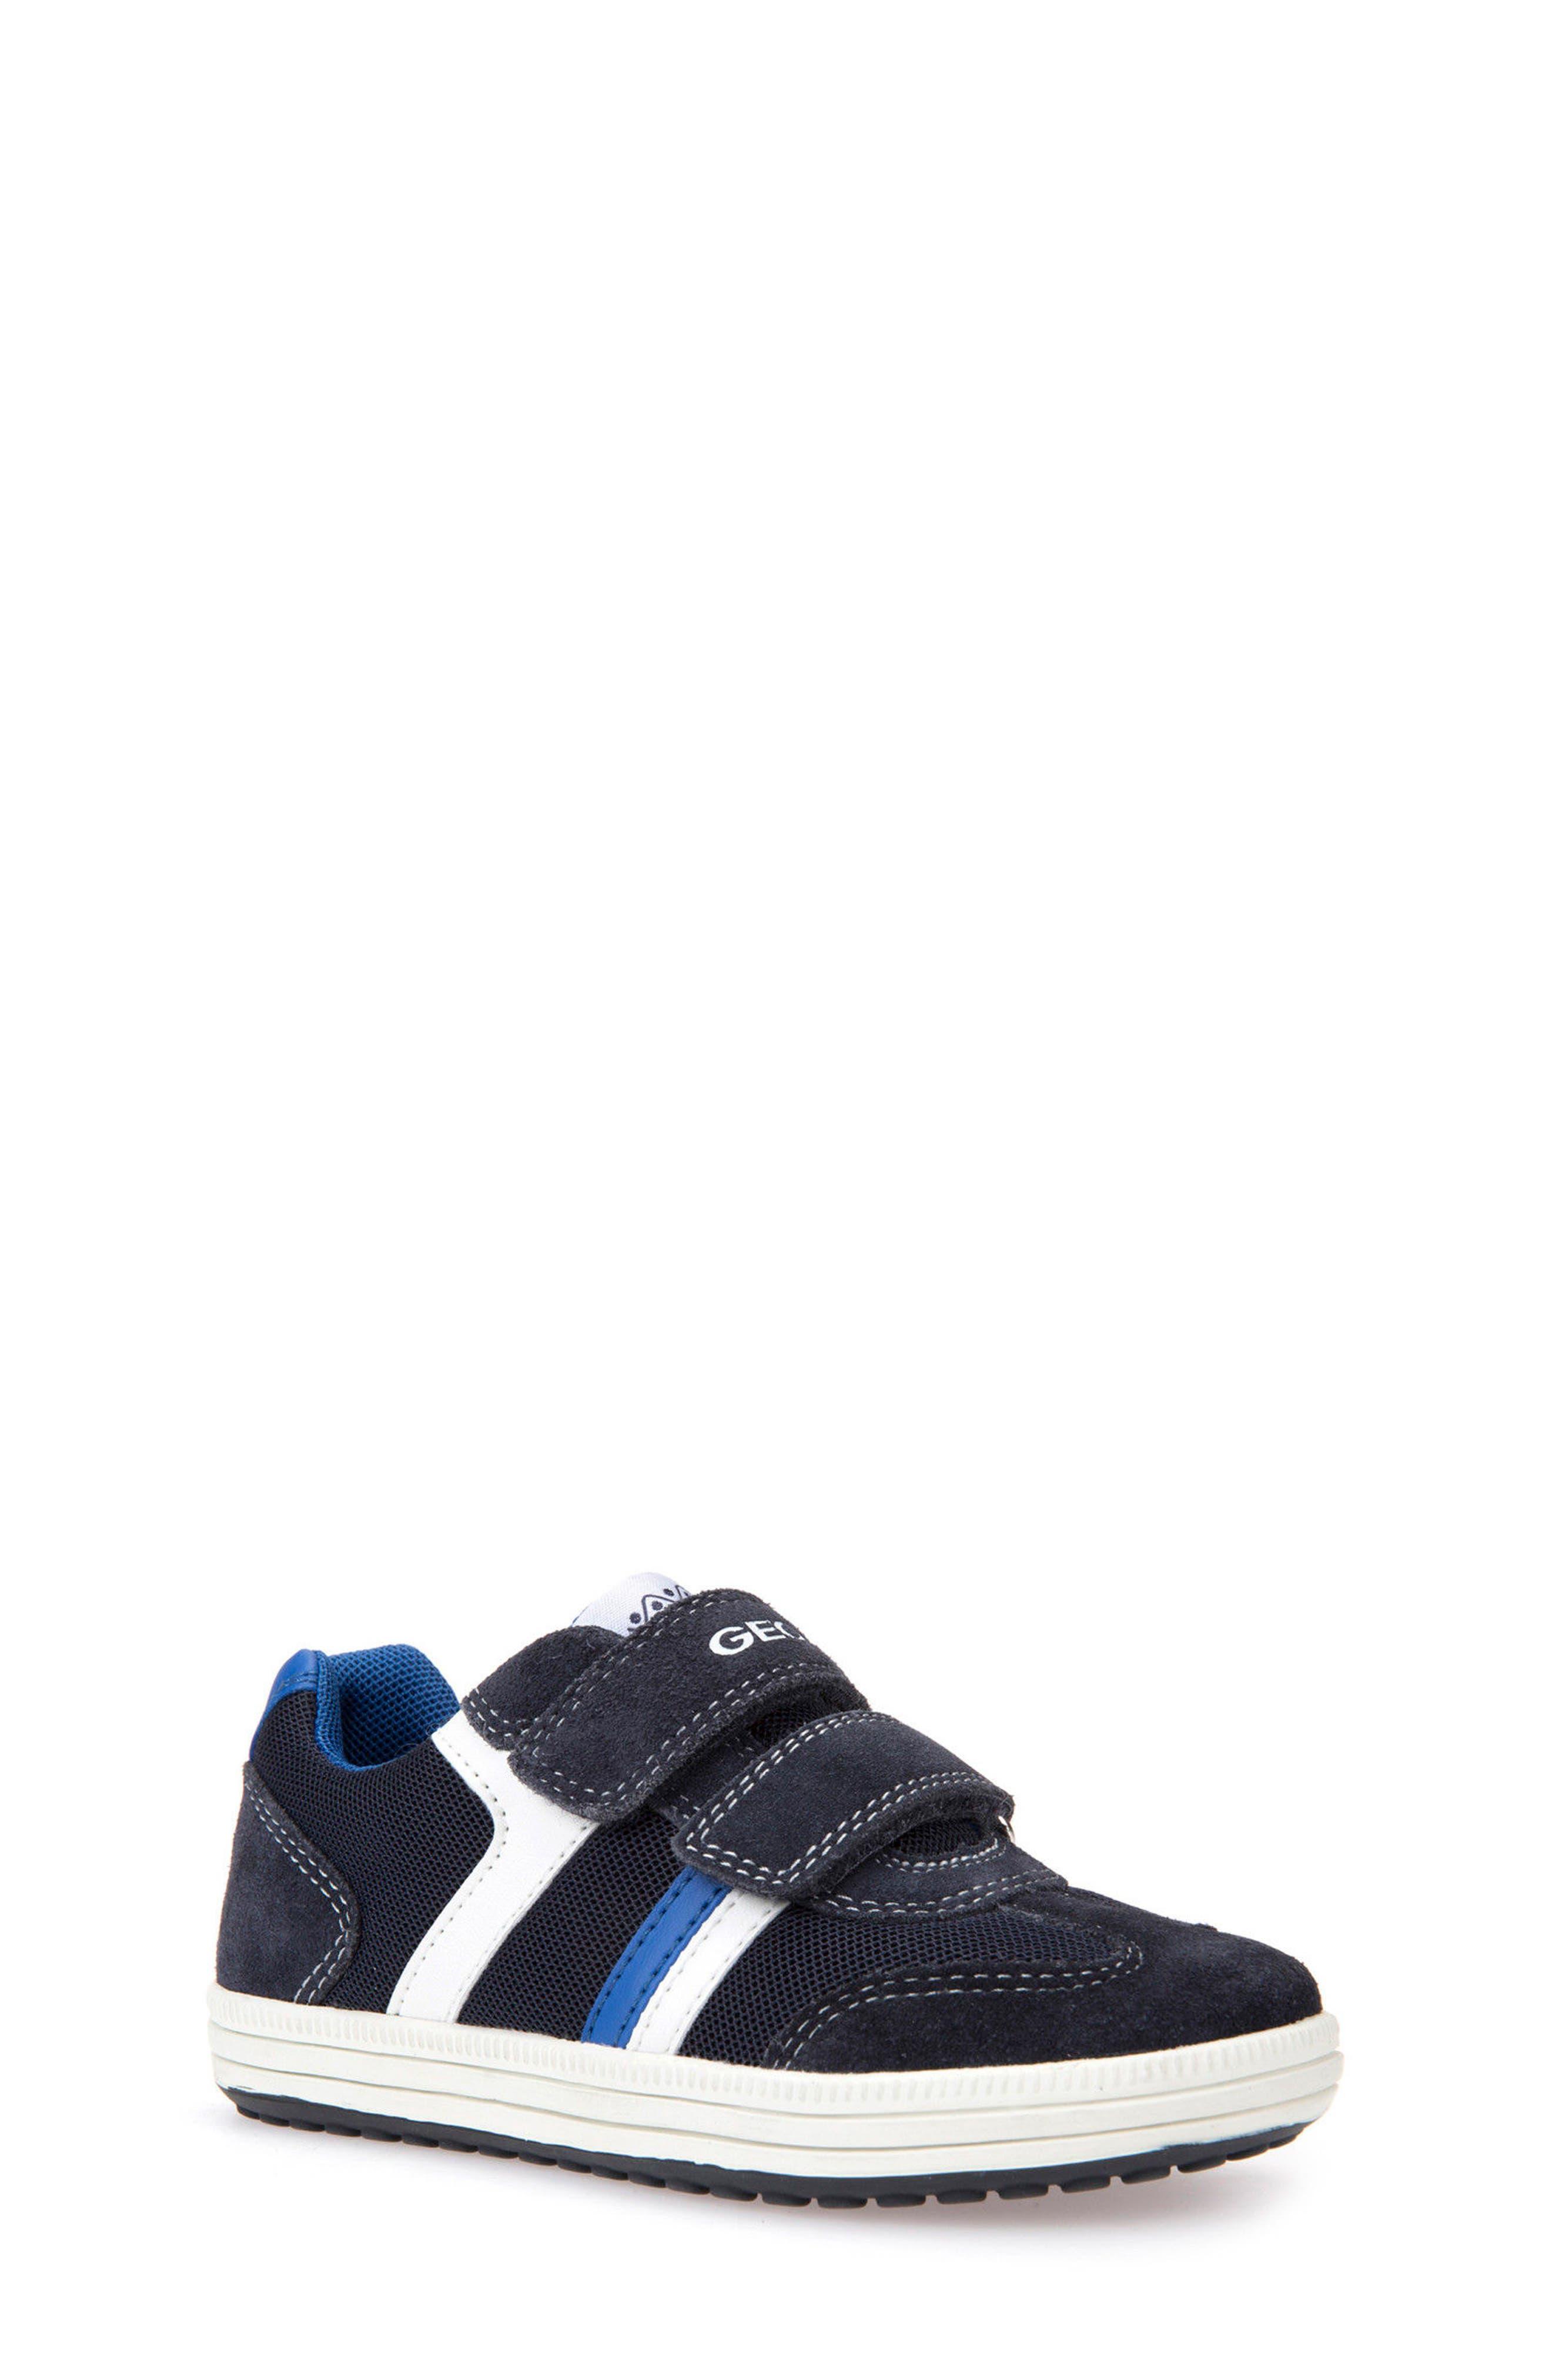 Kilwi Sneaker,                         Main,                         color, Navy/ White